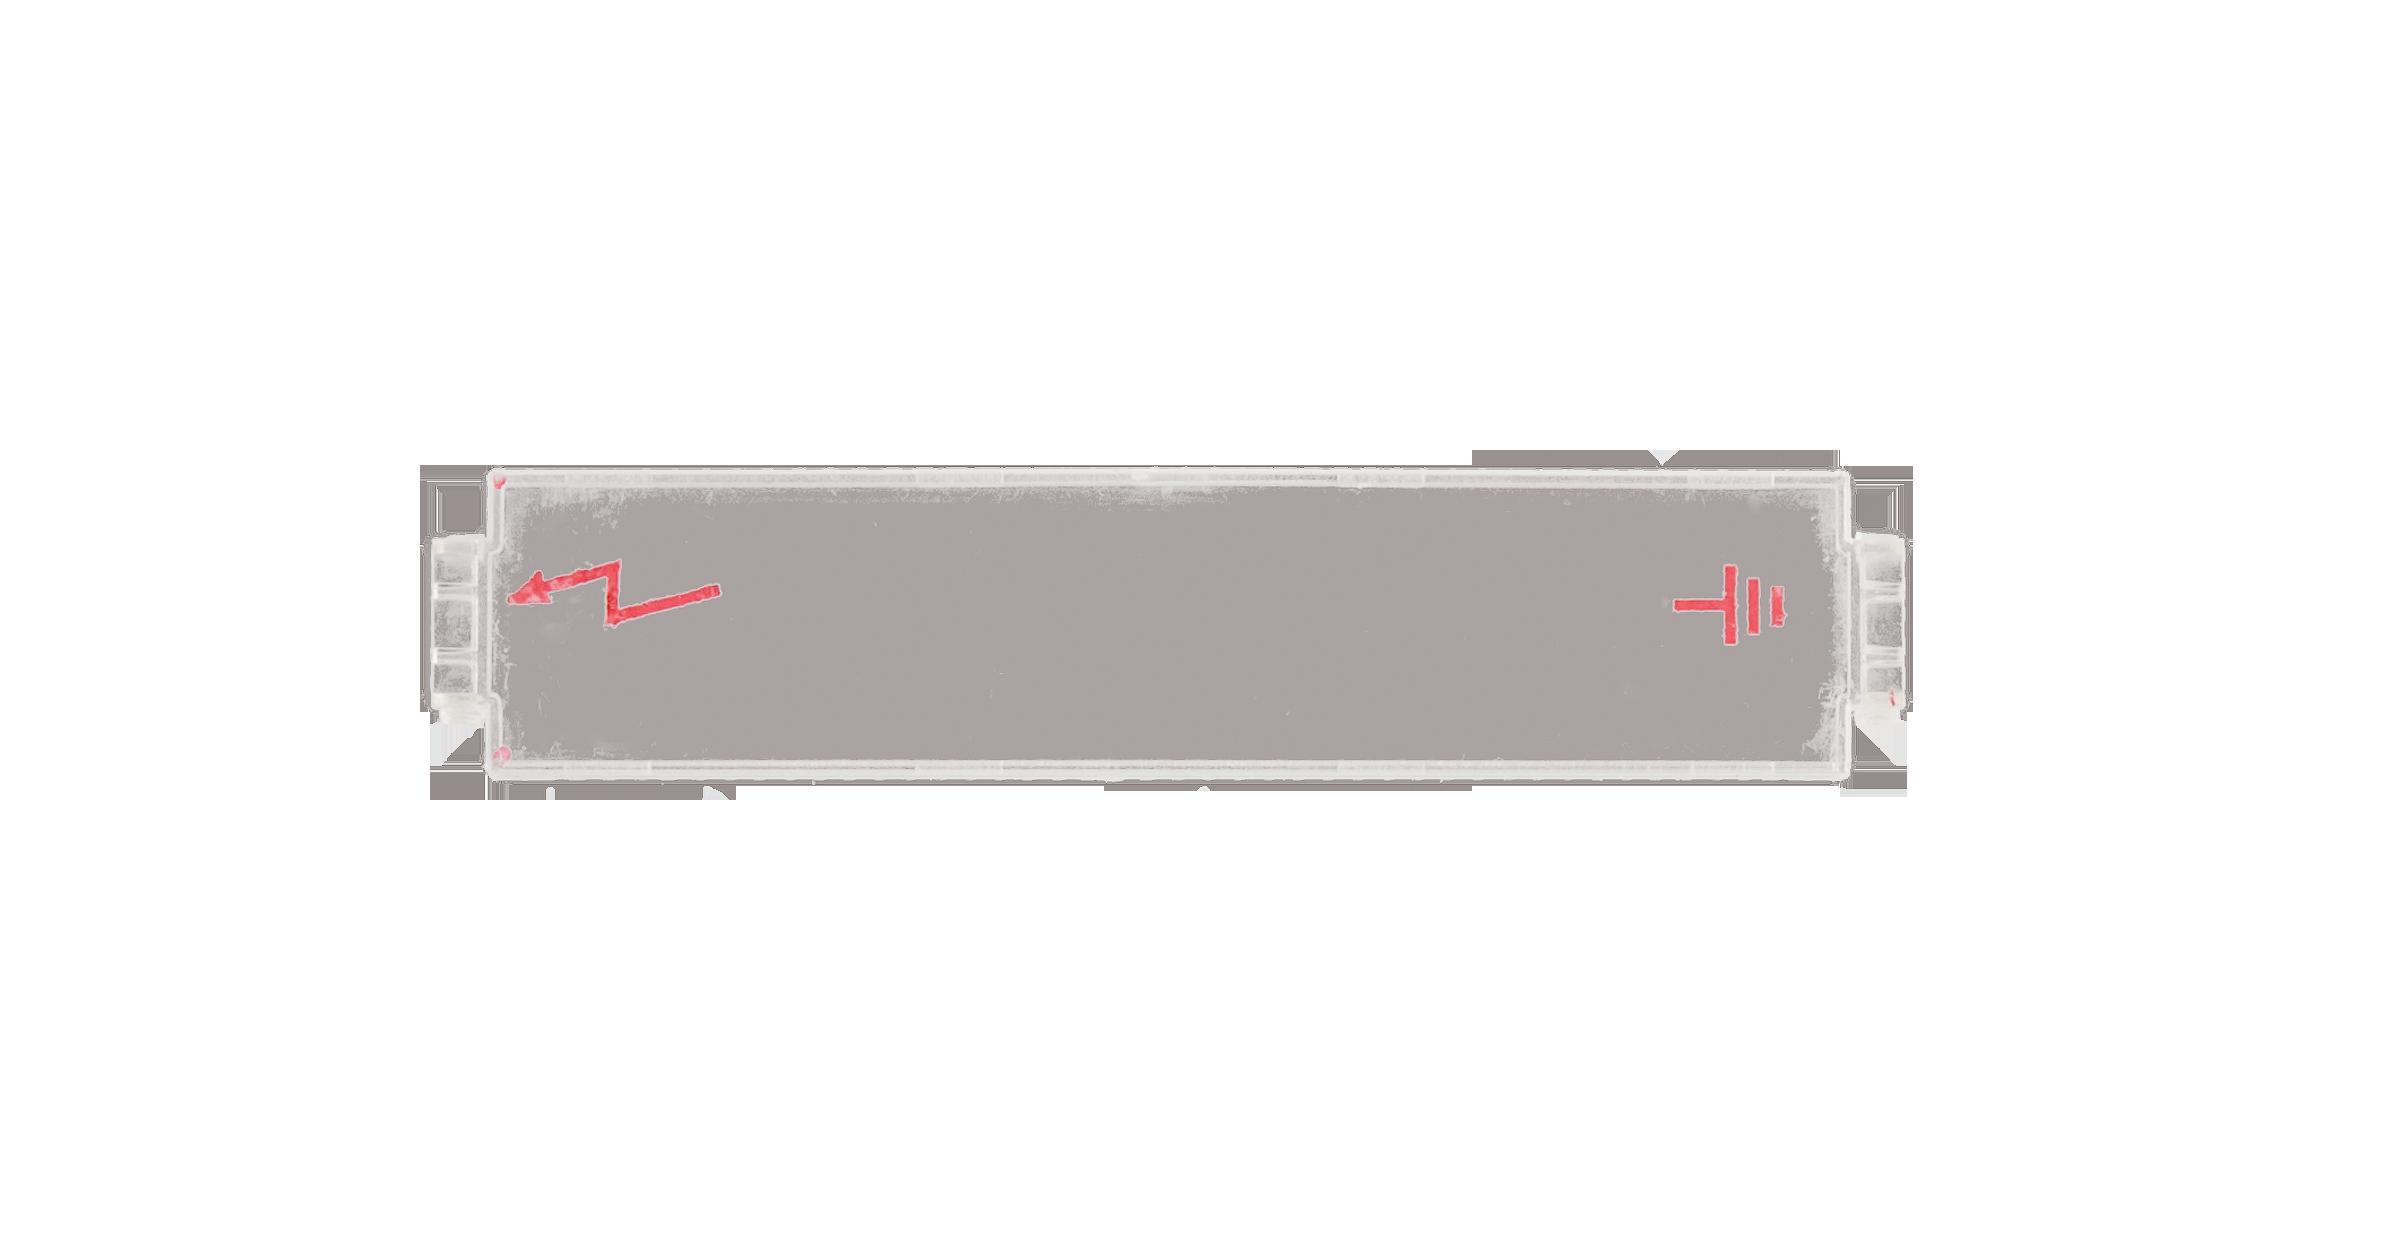 NMC-PL-PM-COVER Противопылевая крышка NIKOMAX для магазина защиты по напряжению, прозрачная